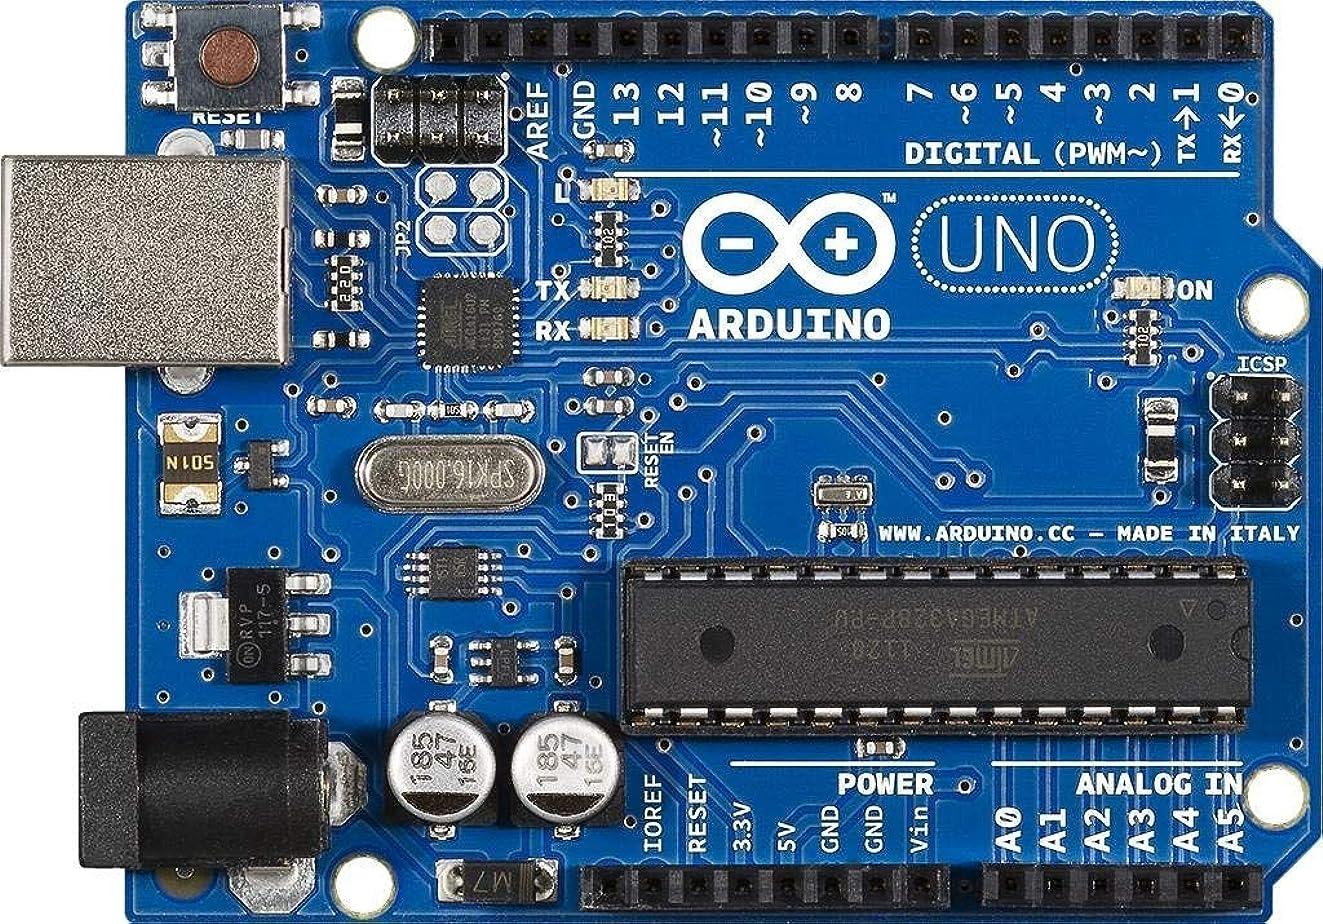 Arduino Uno R3 Development Board, Kit Microcontroller Based on ATmega328 and ATMEGA16U2 with USB Cable for Arduino, Original